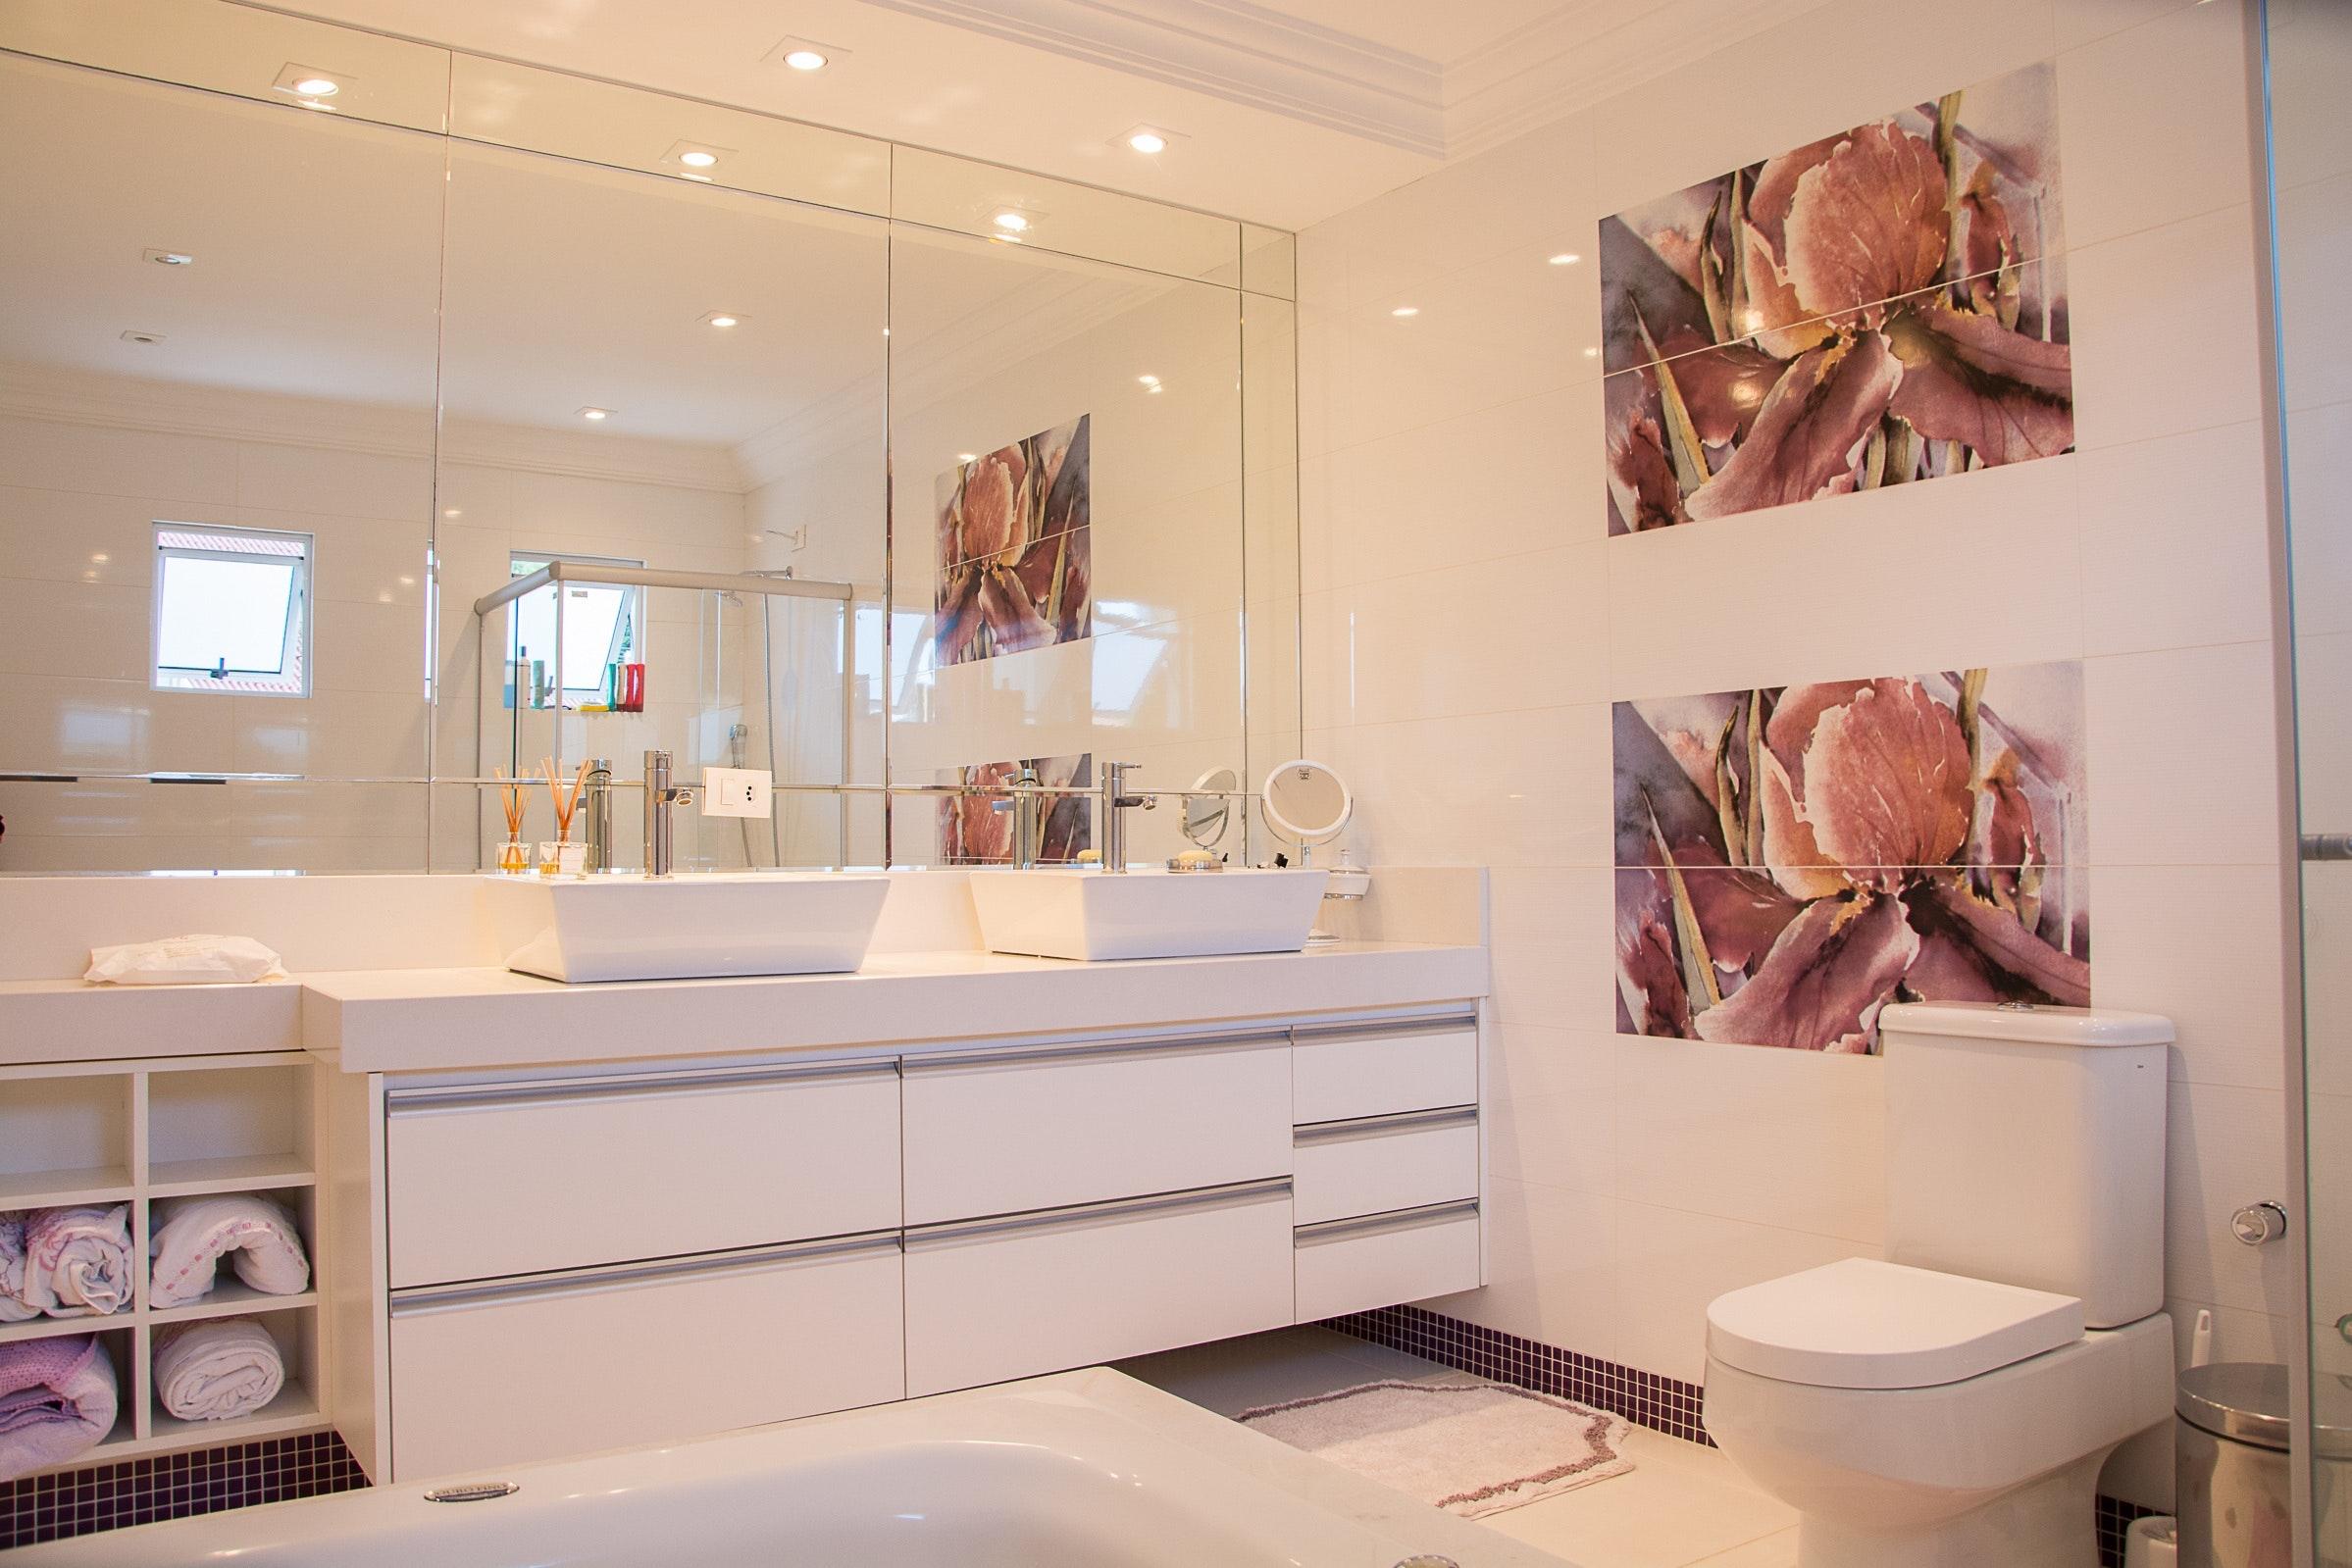 architecture-bathroom-contemporary-28020